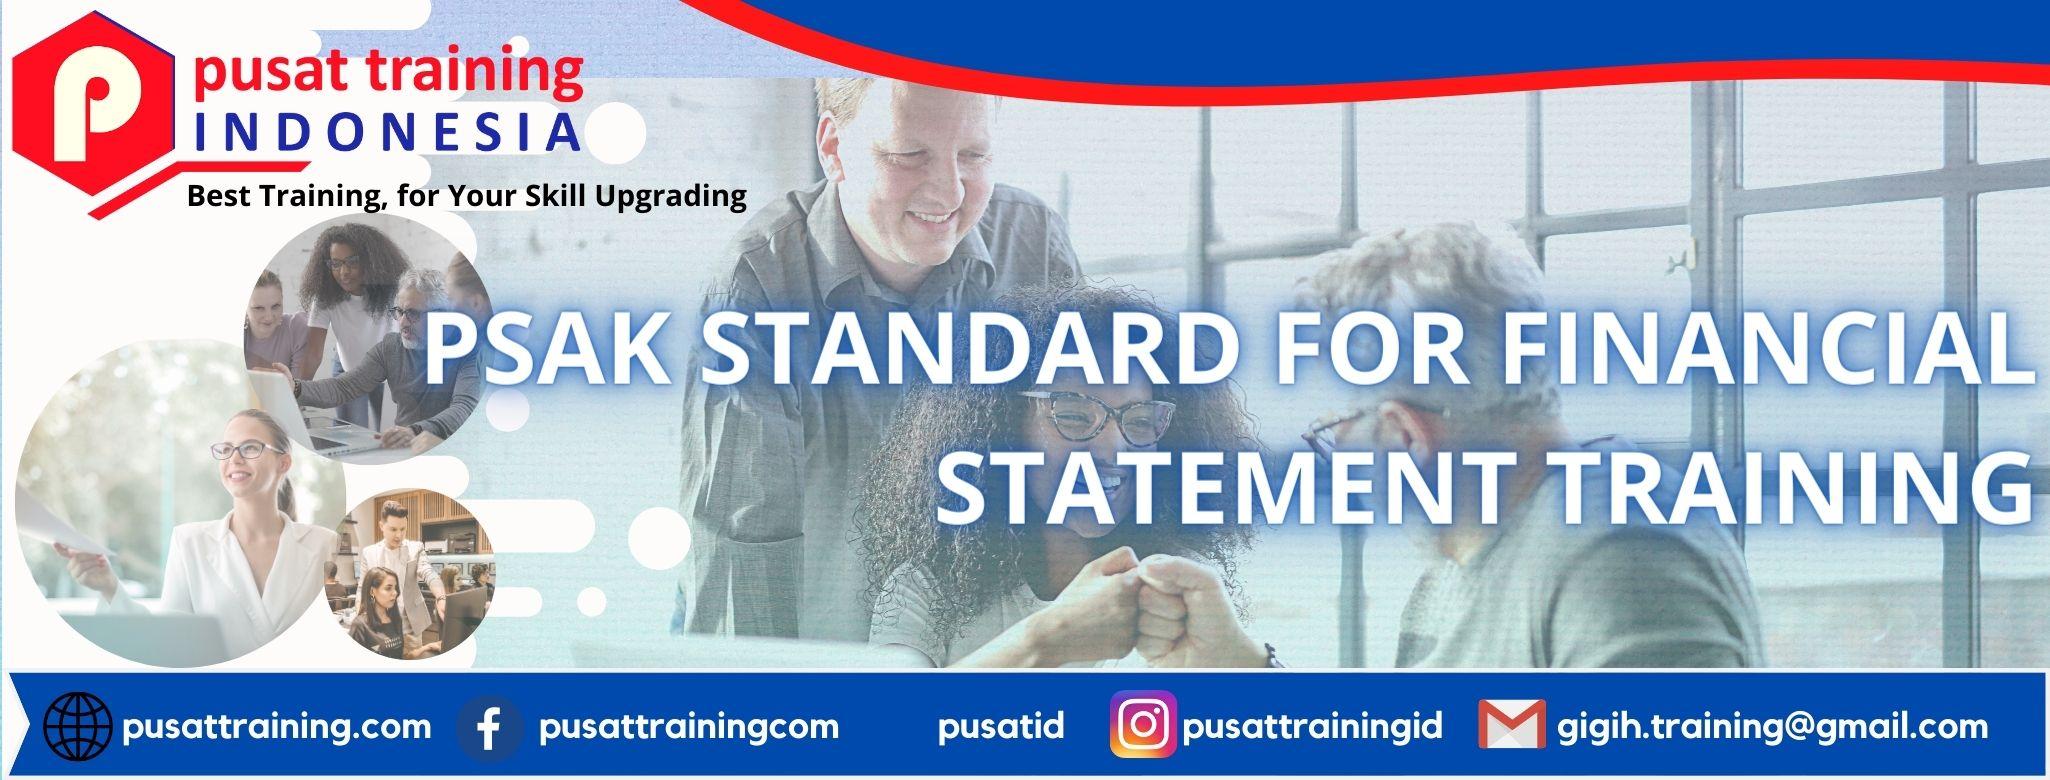 PSAK-Standard-For-Financial-Statement-Training